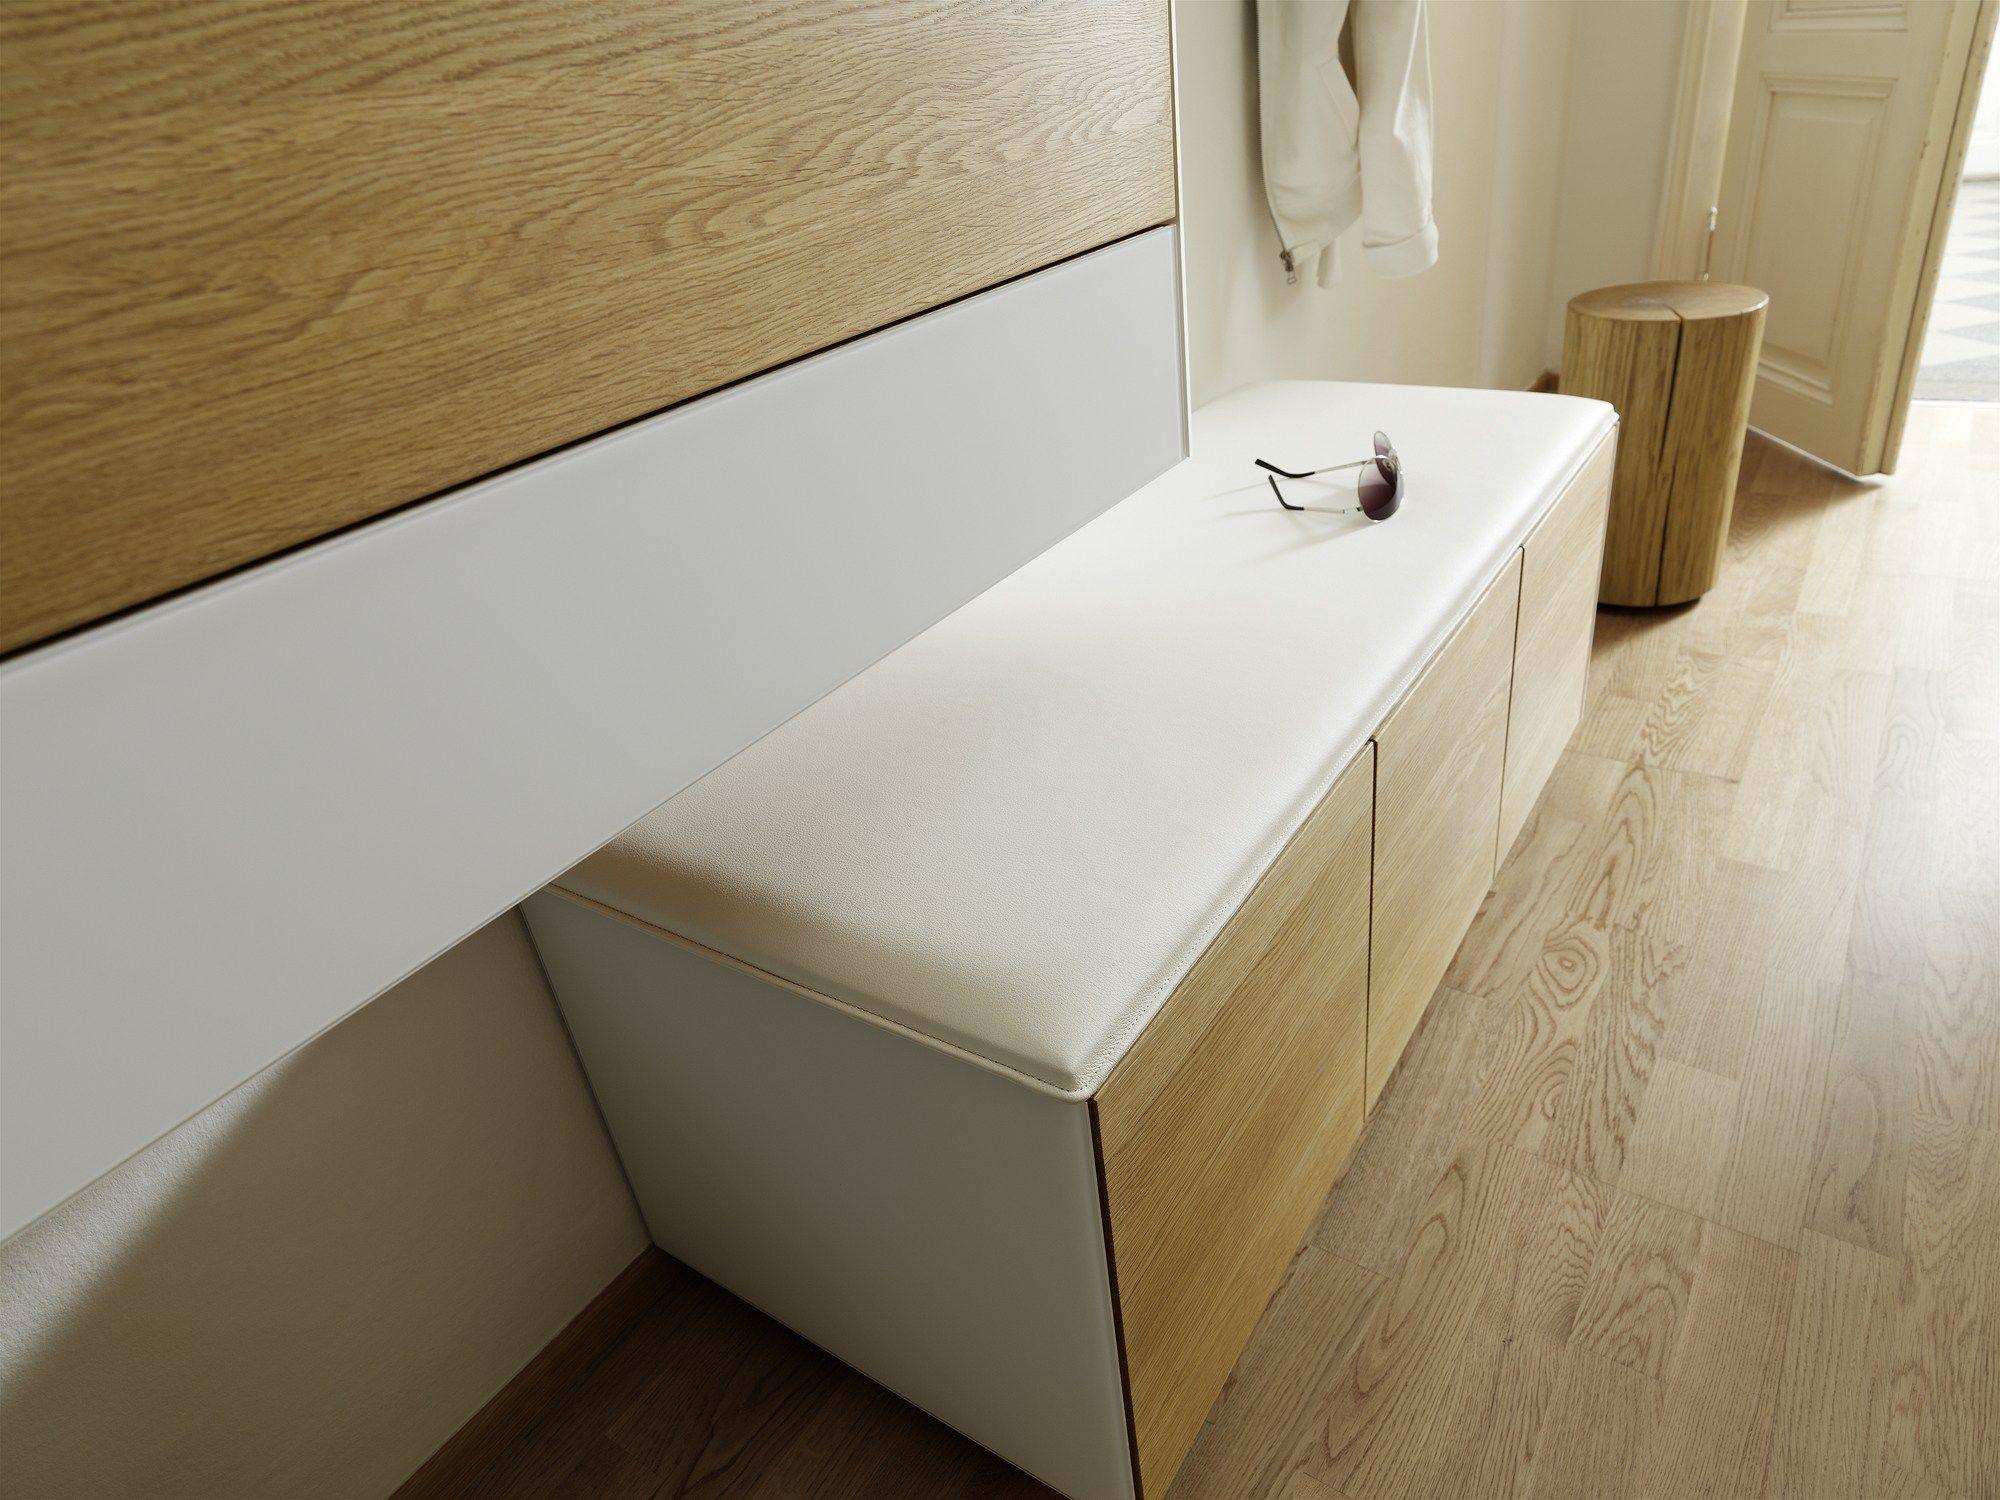 cubus pure anbau fl rm bel by team 7 nat rlich wohnen design sebastian desch. Black Bedroom Furniture Sets. Home Design Ideas